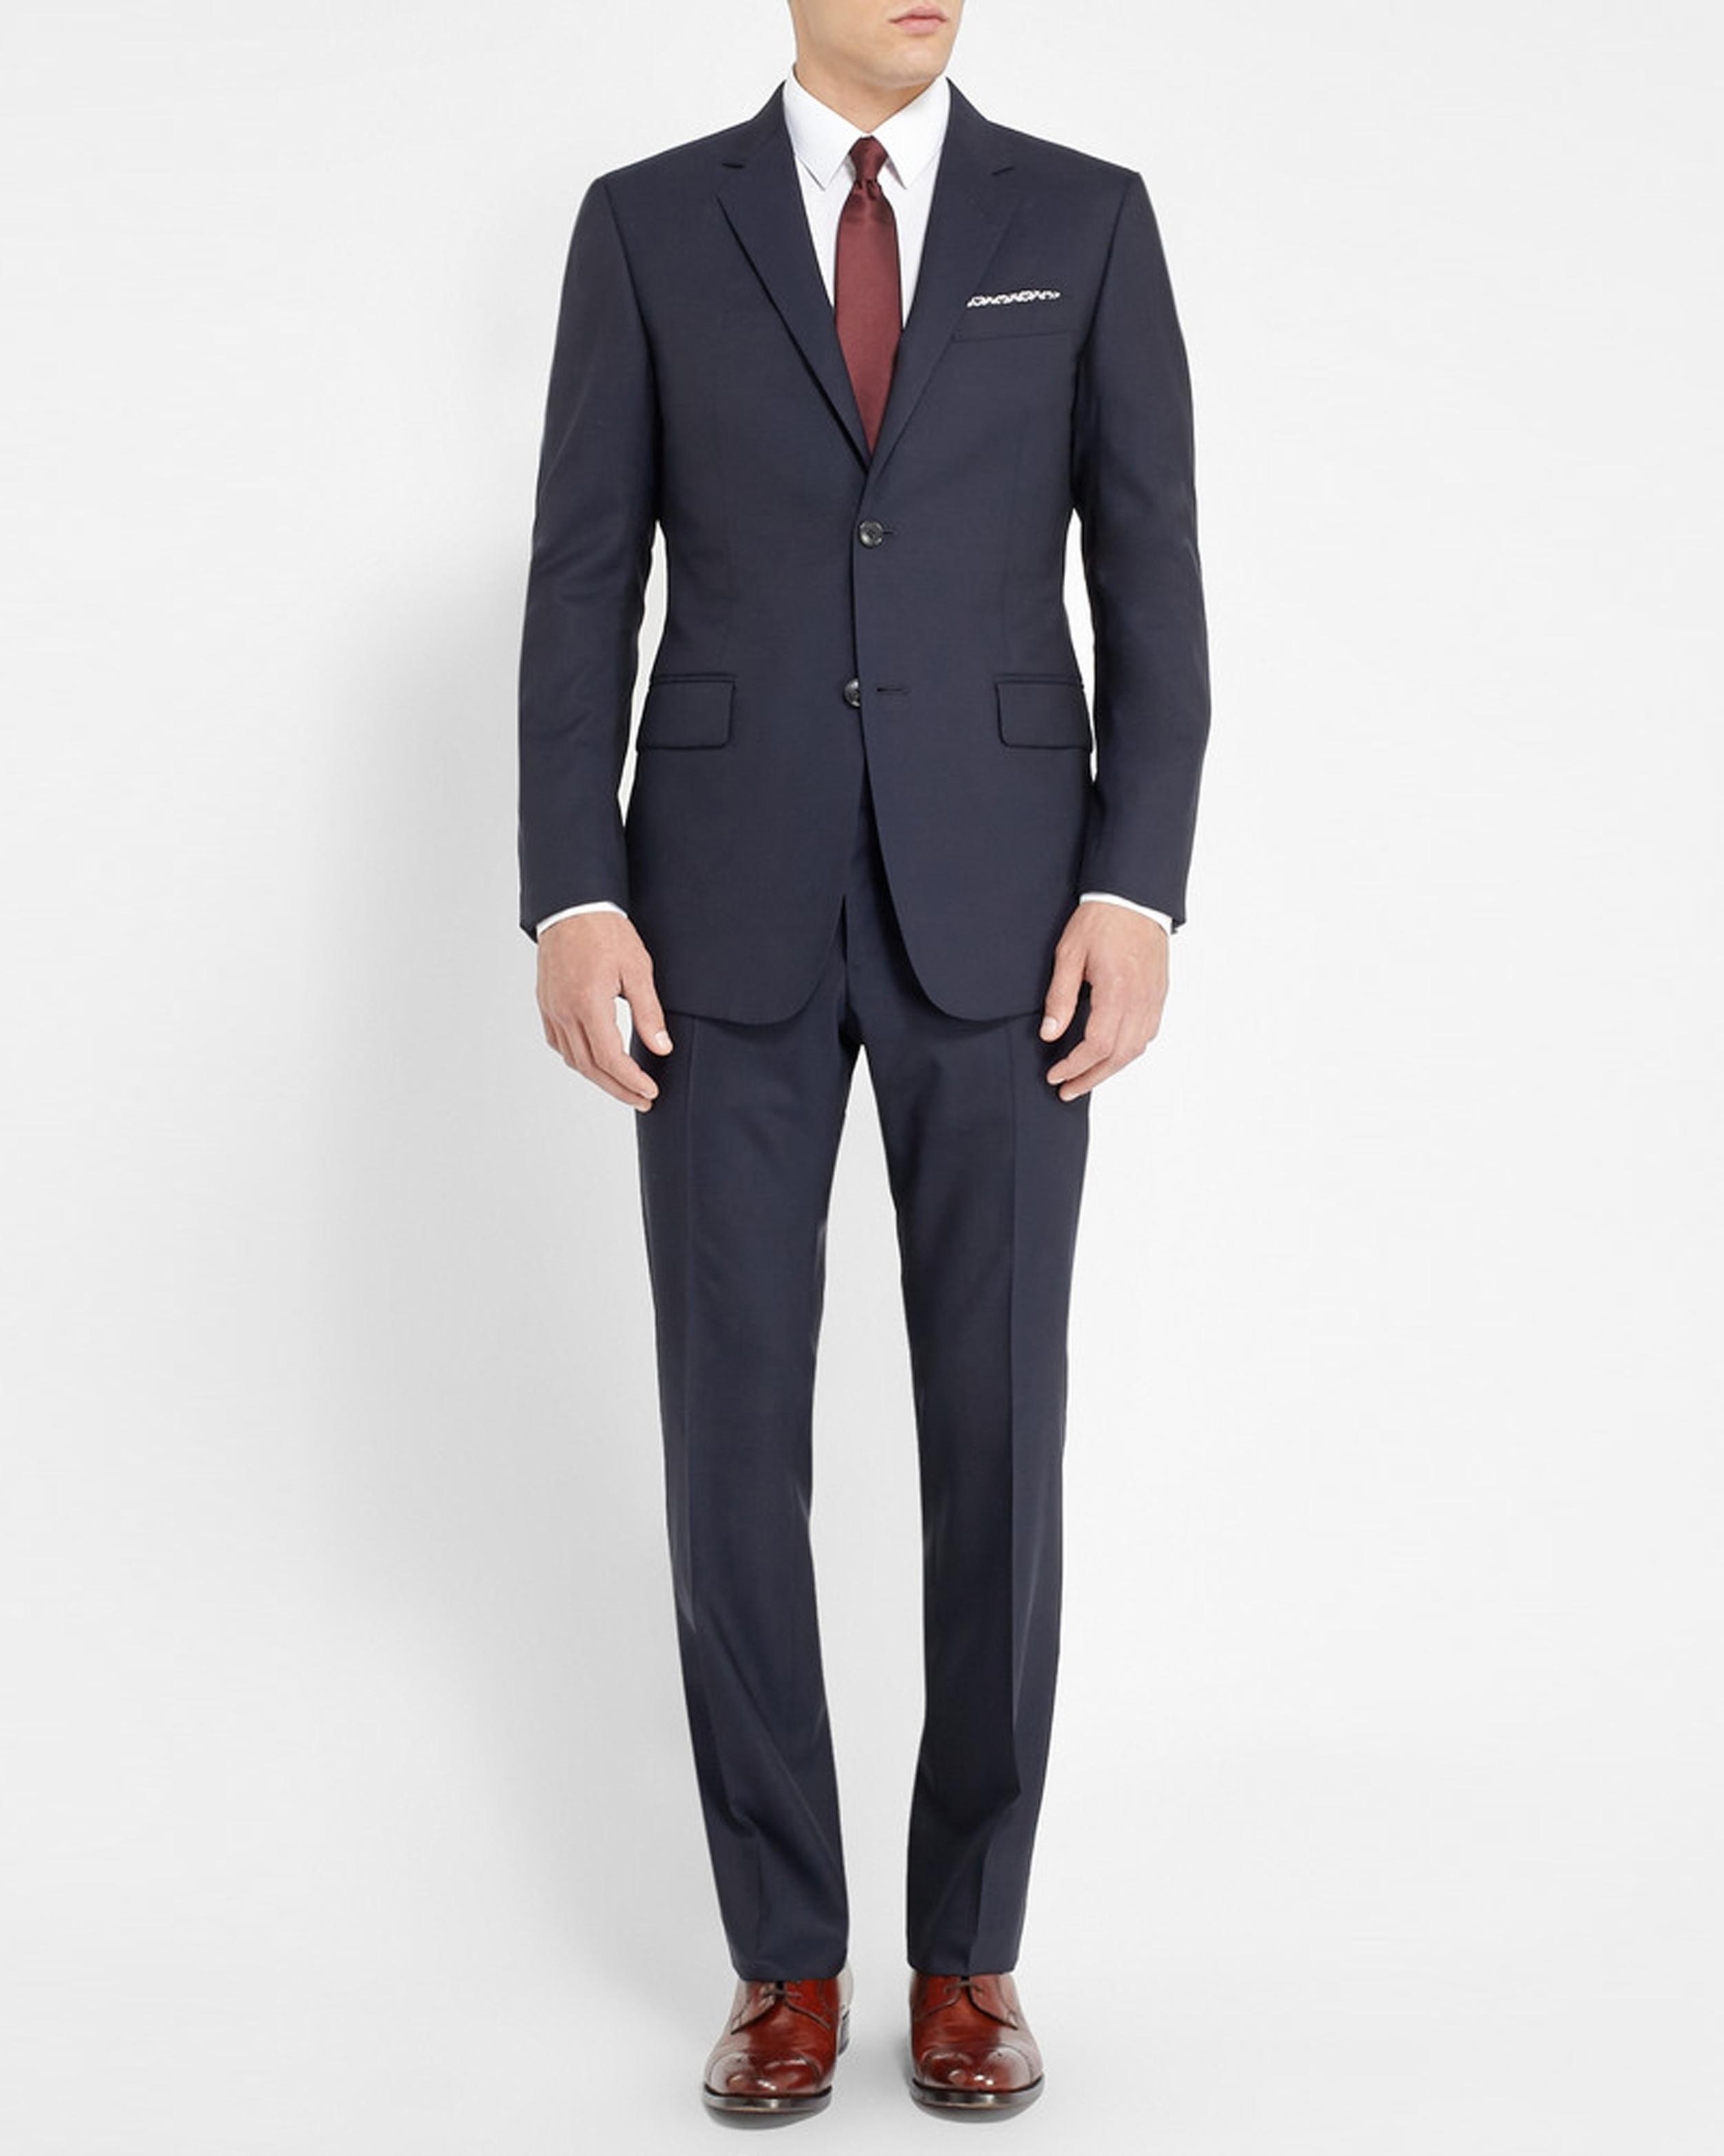 fall-groom-suits-mr-porter-gucci-brera-suit-1014.jpg